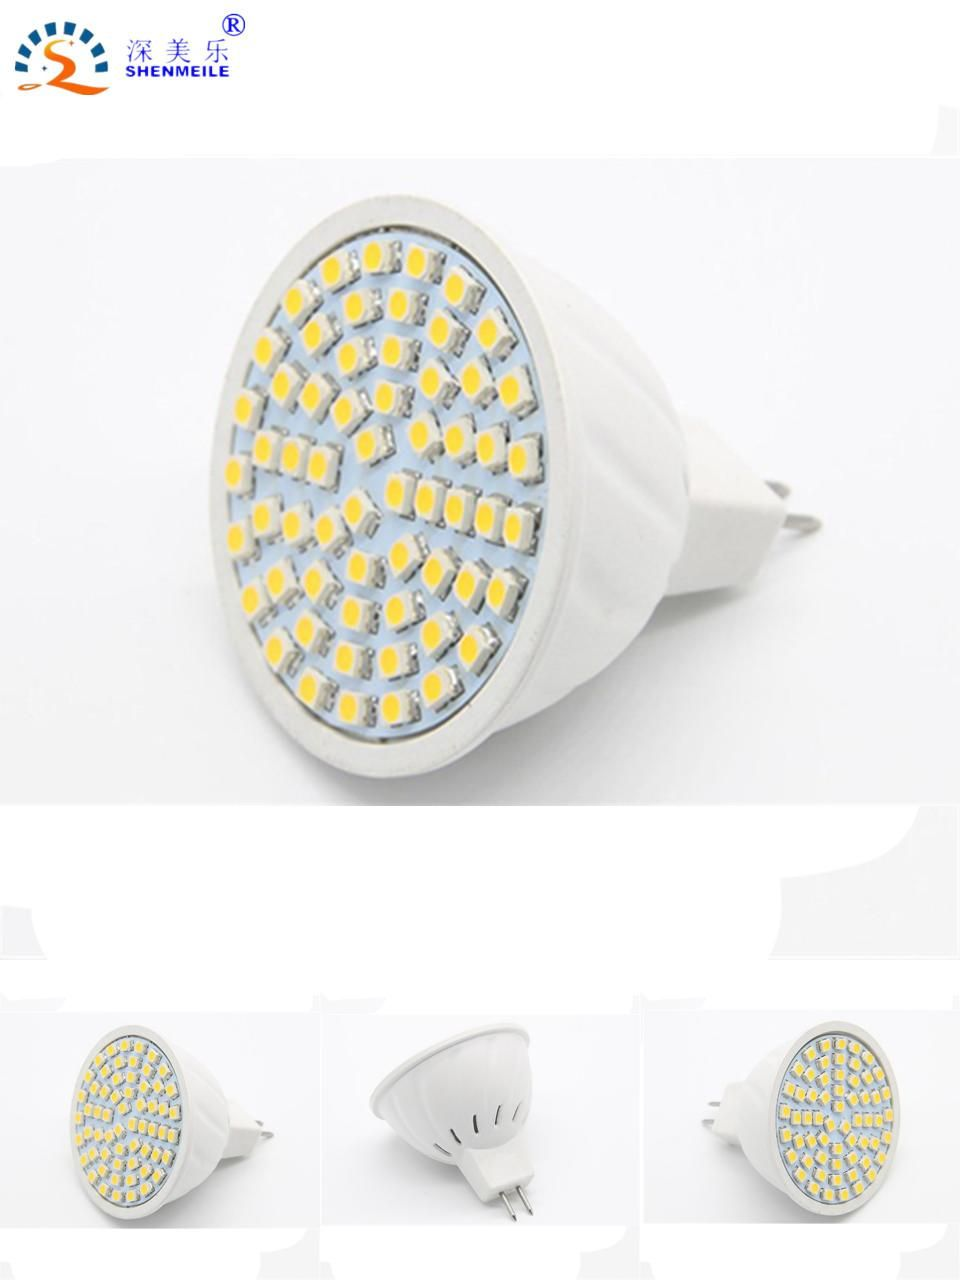 Visit To Buy 1pcs Led Spotlight Mr16 3w 120degree Cob Smd Led Bulb Halogen Light Lamp Shenzhen 12v Dc Ce Rohs Advertisemen Led Spotlight Led Bulb Lamp Light